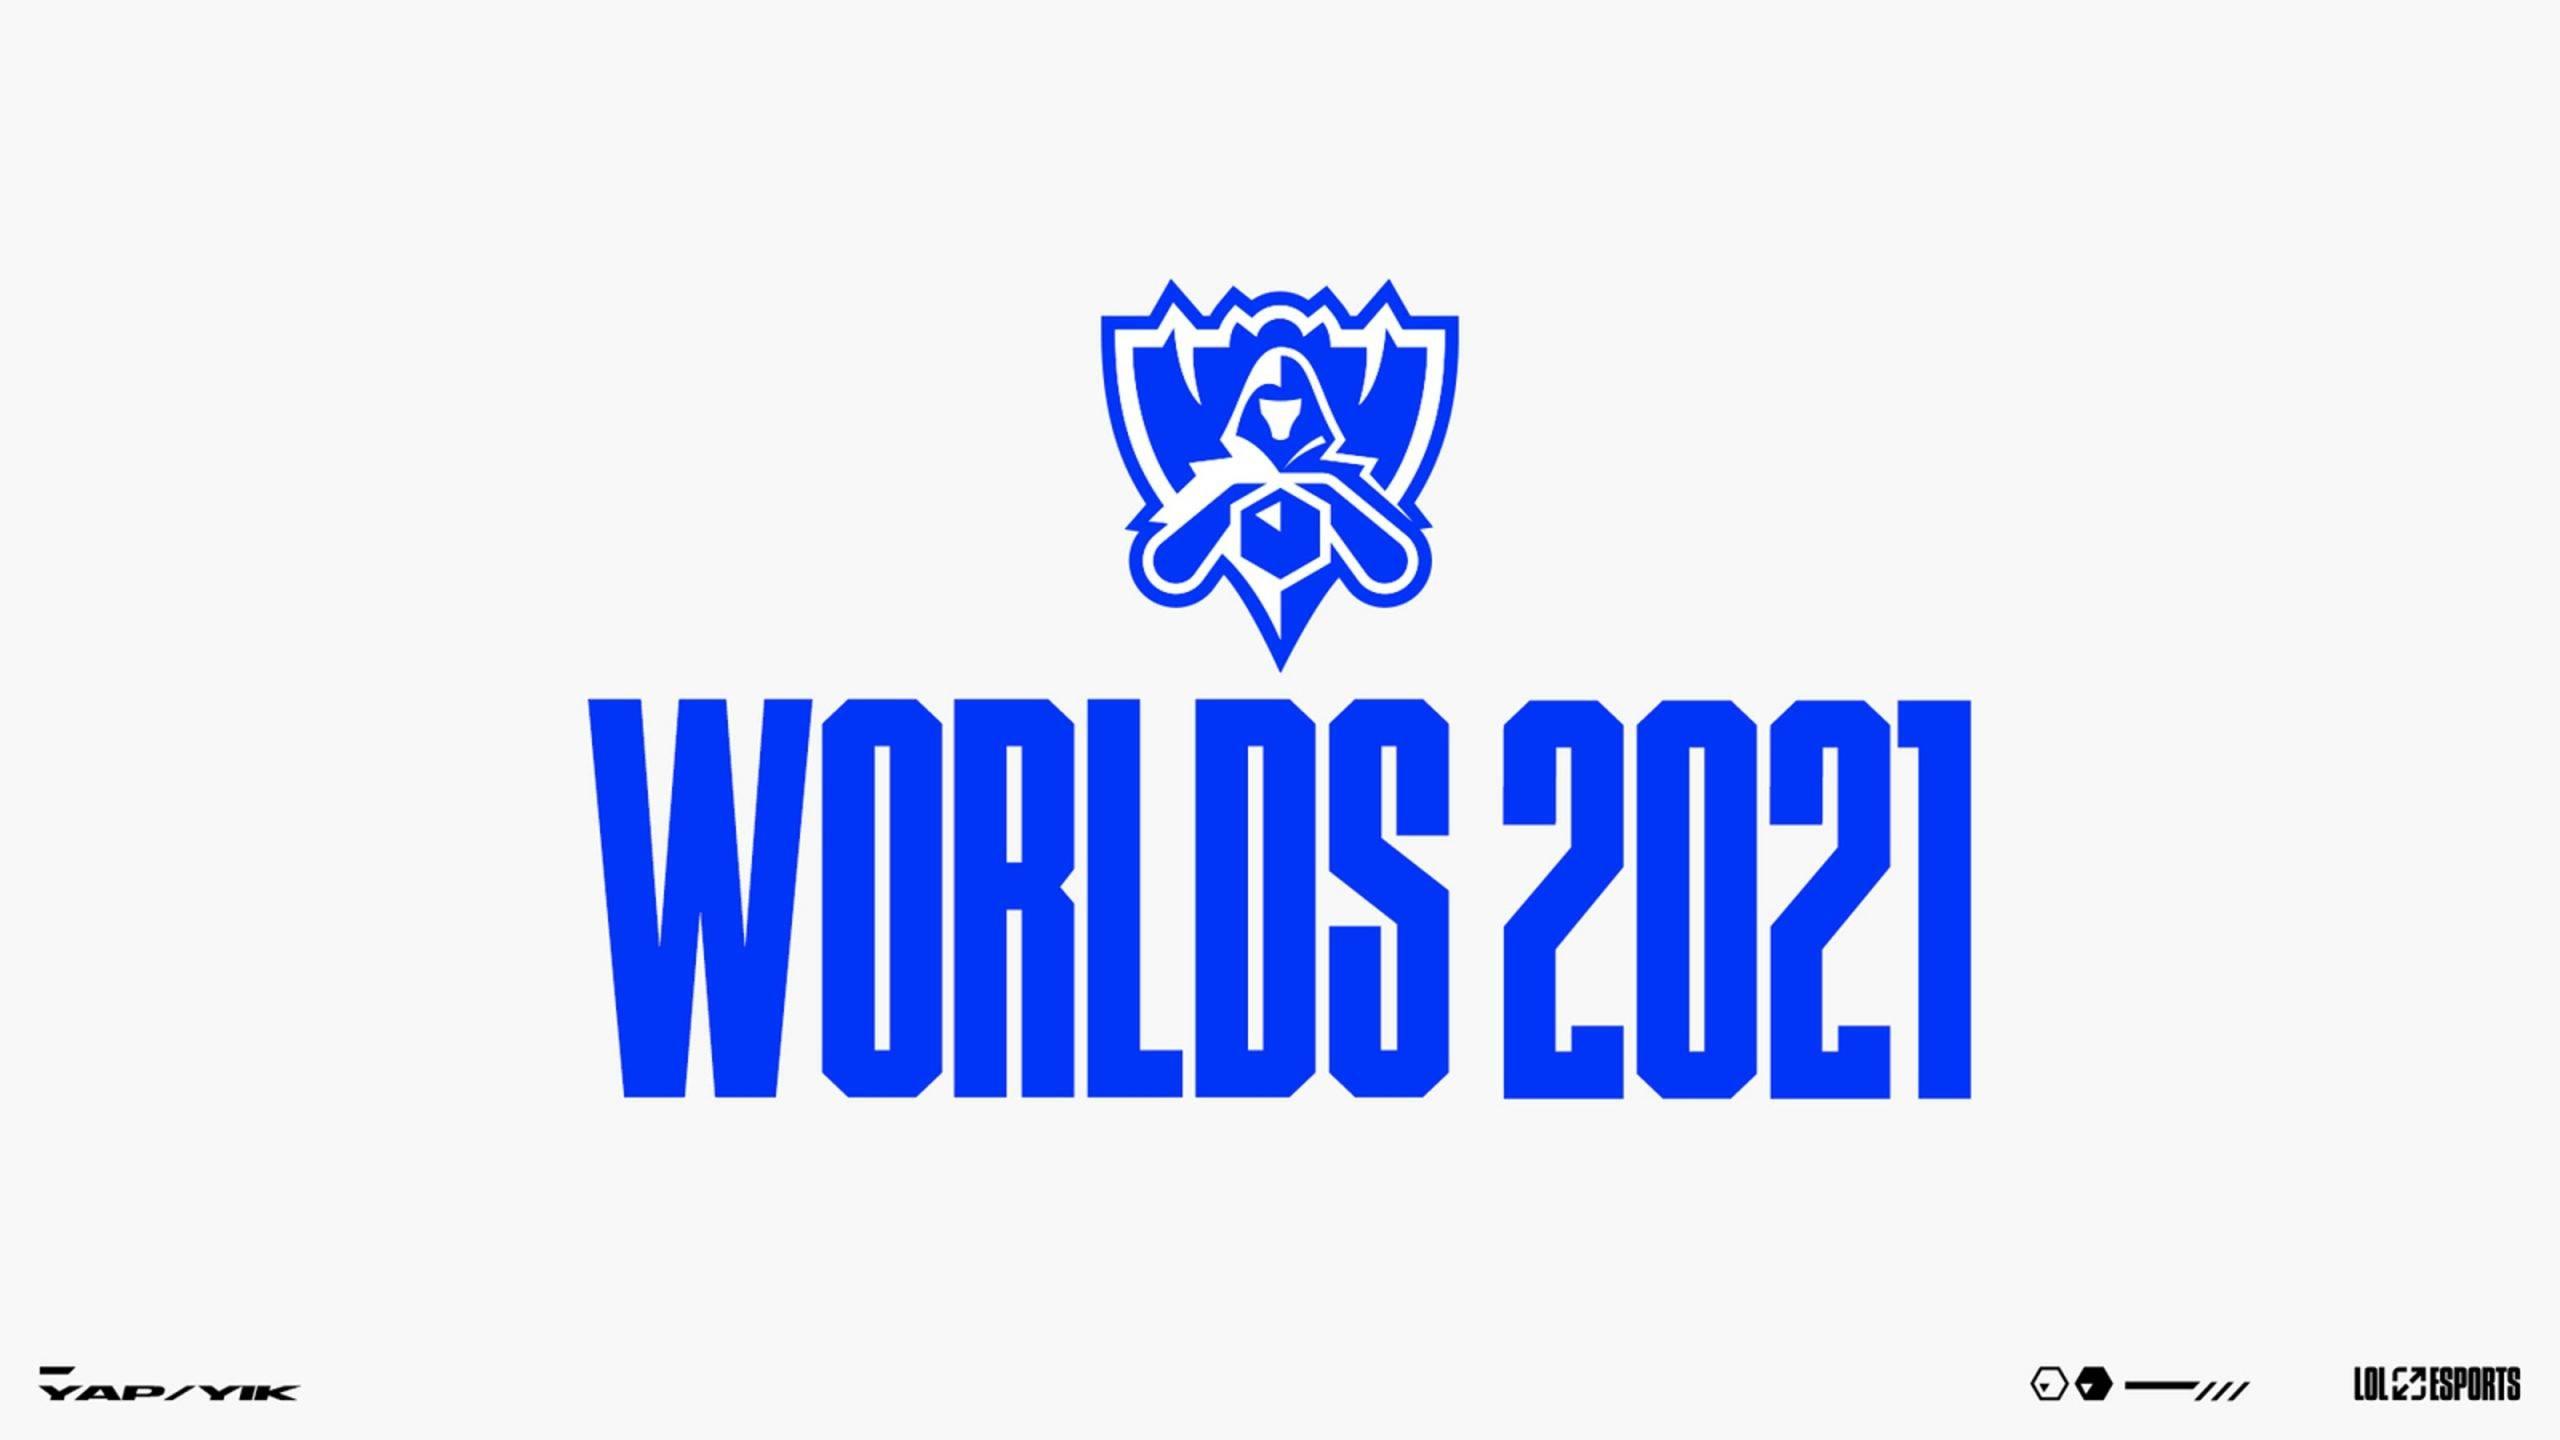 TR WORLDS2021 16x9 v2 1 1600x900 scaled